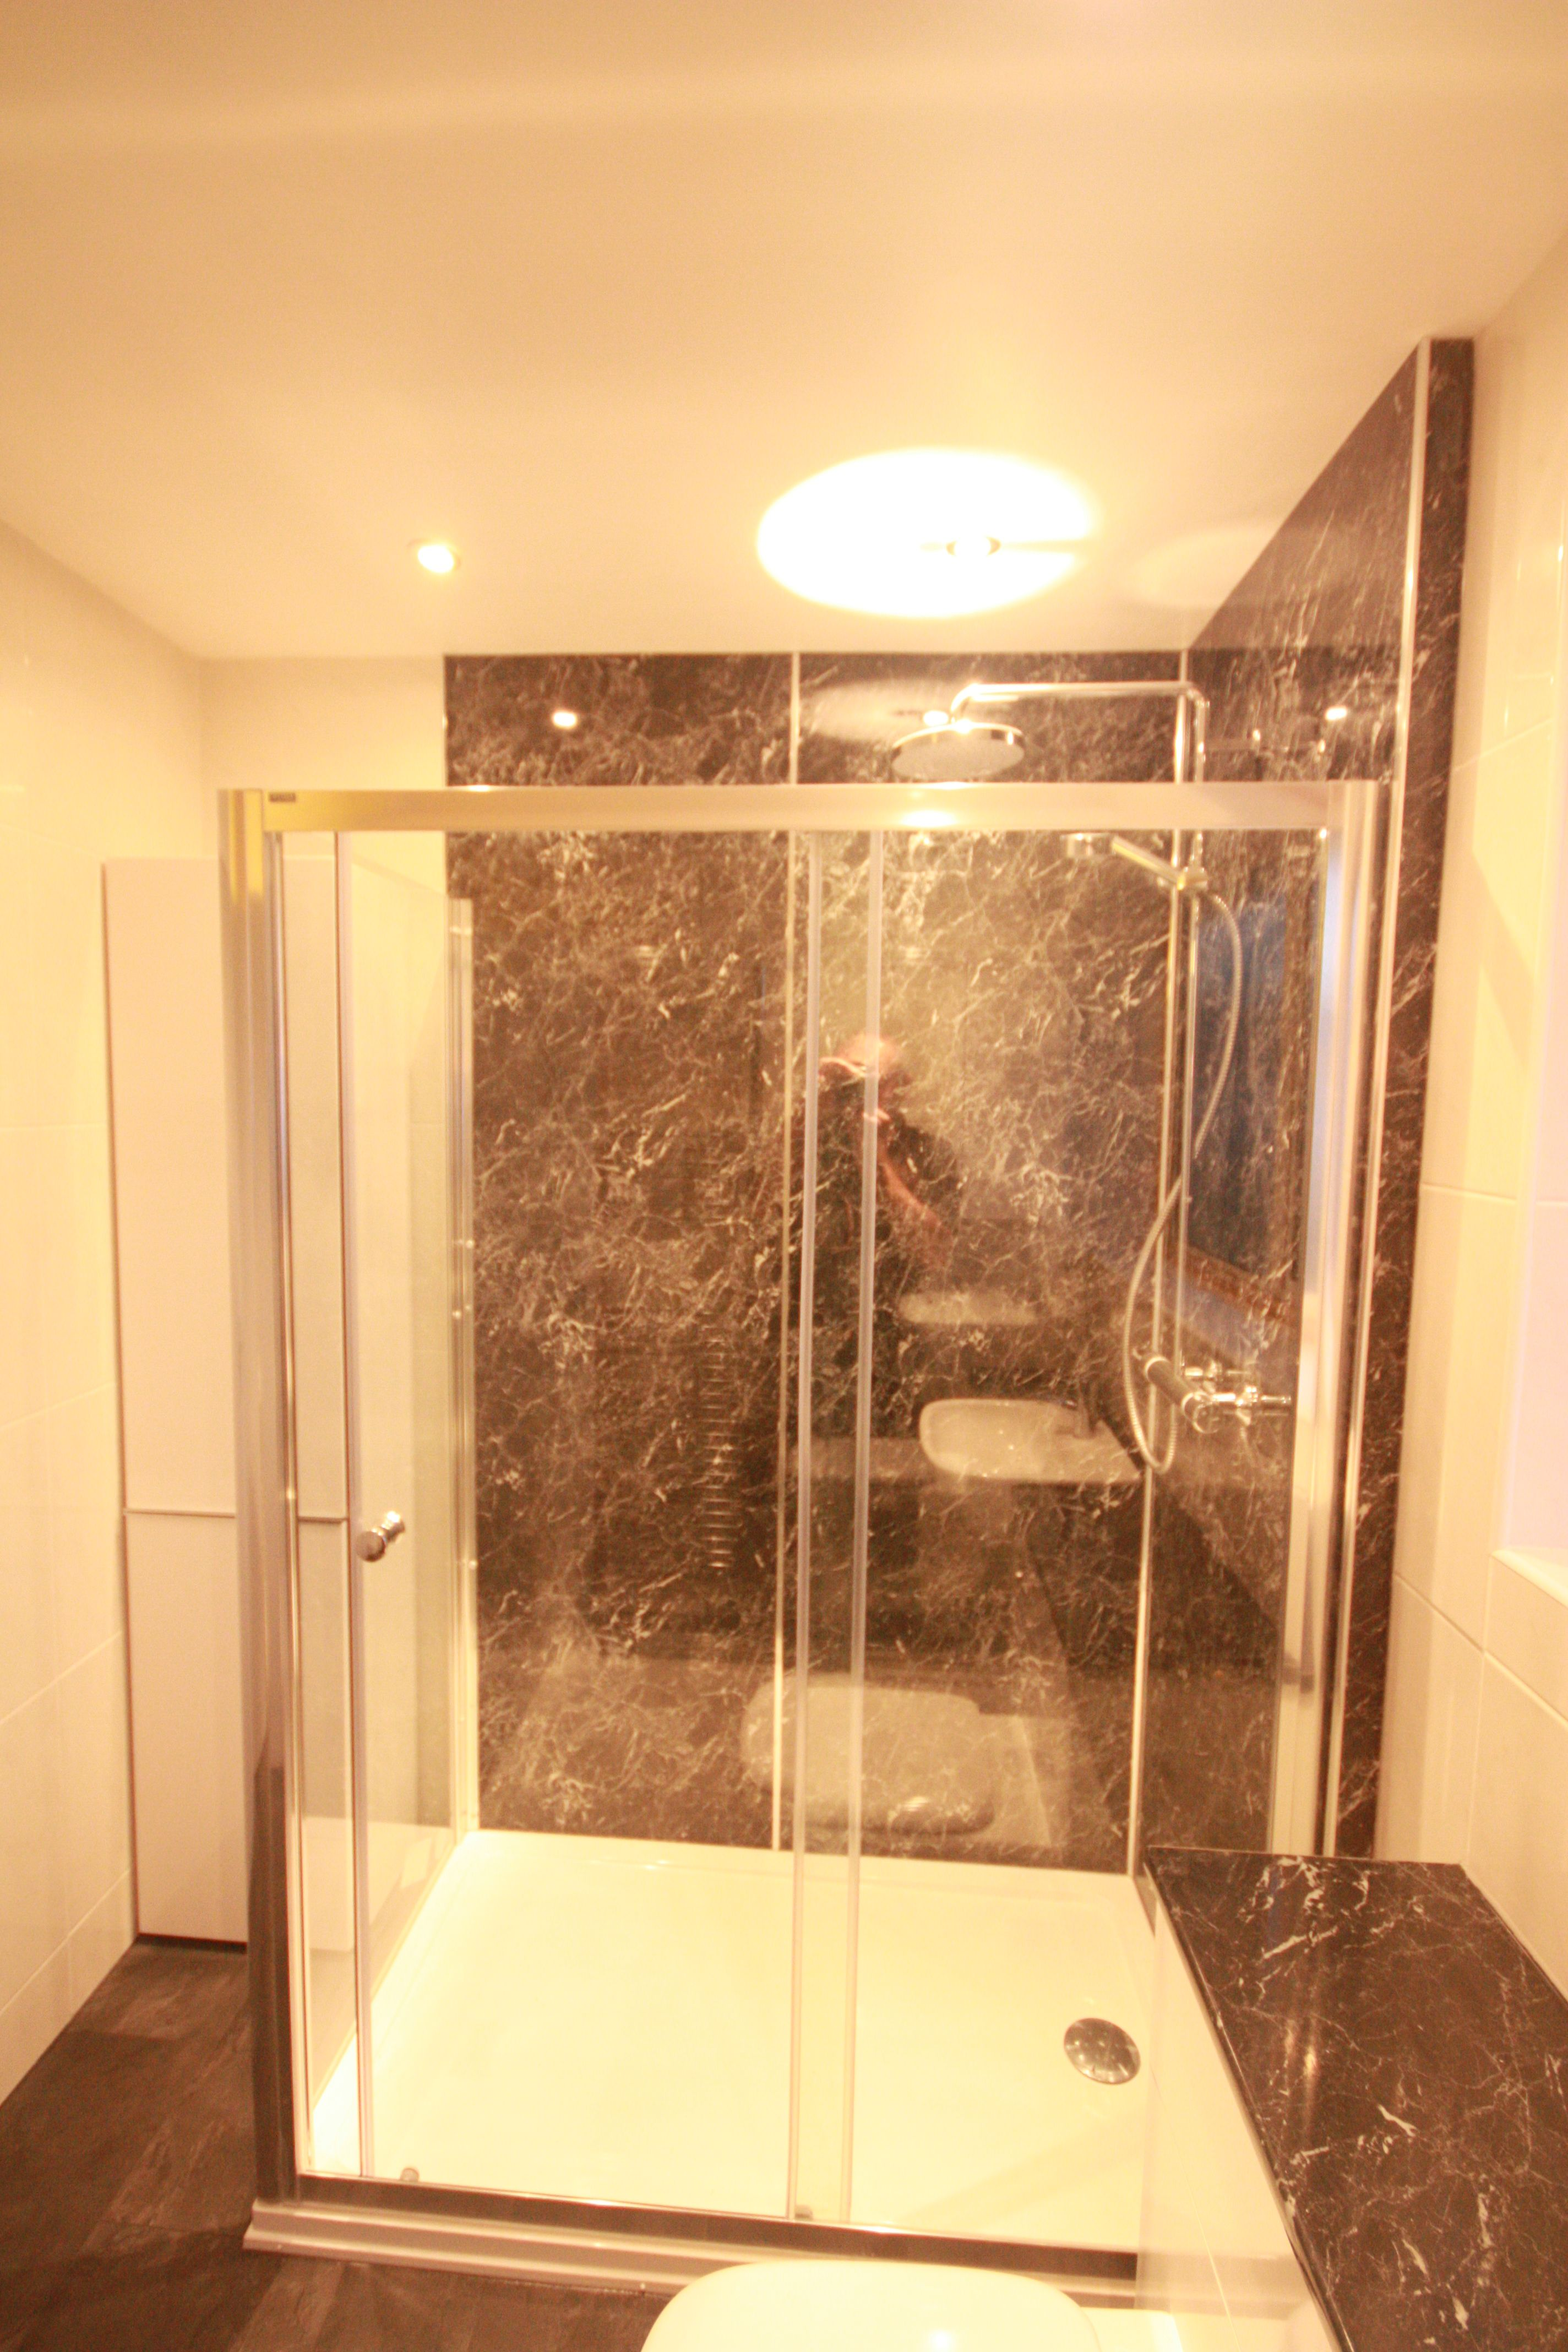 Aqua Panels Make A Super Sleek Easy Clean Shower Enclosure Many - Easy to clean bathroom tile